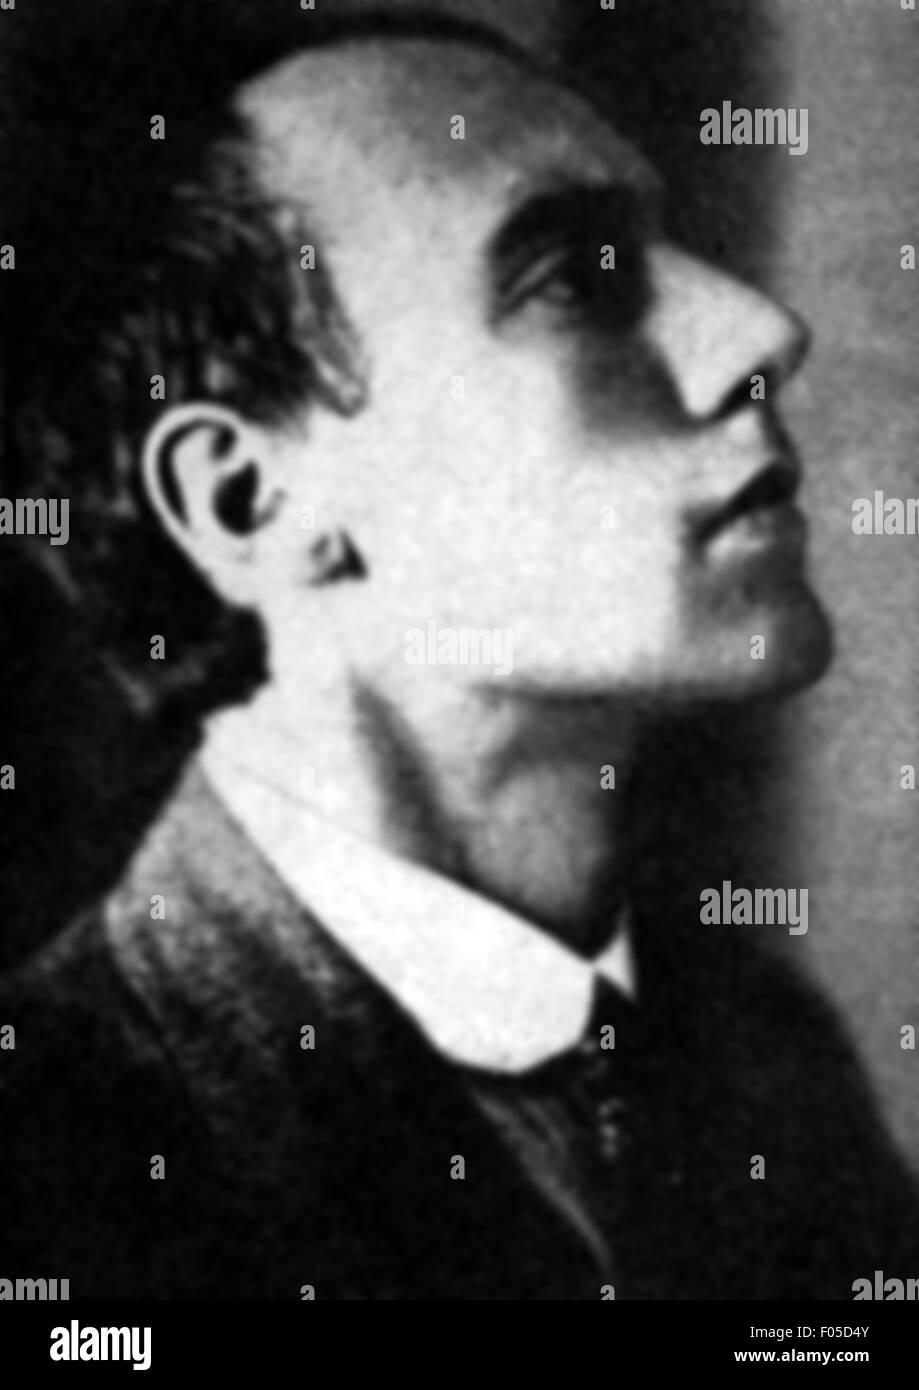 Johannes Robert Becher, 1920s - Stock Image